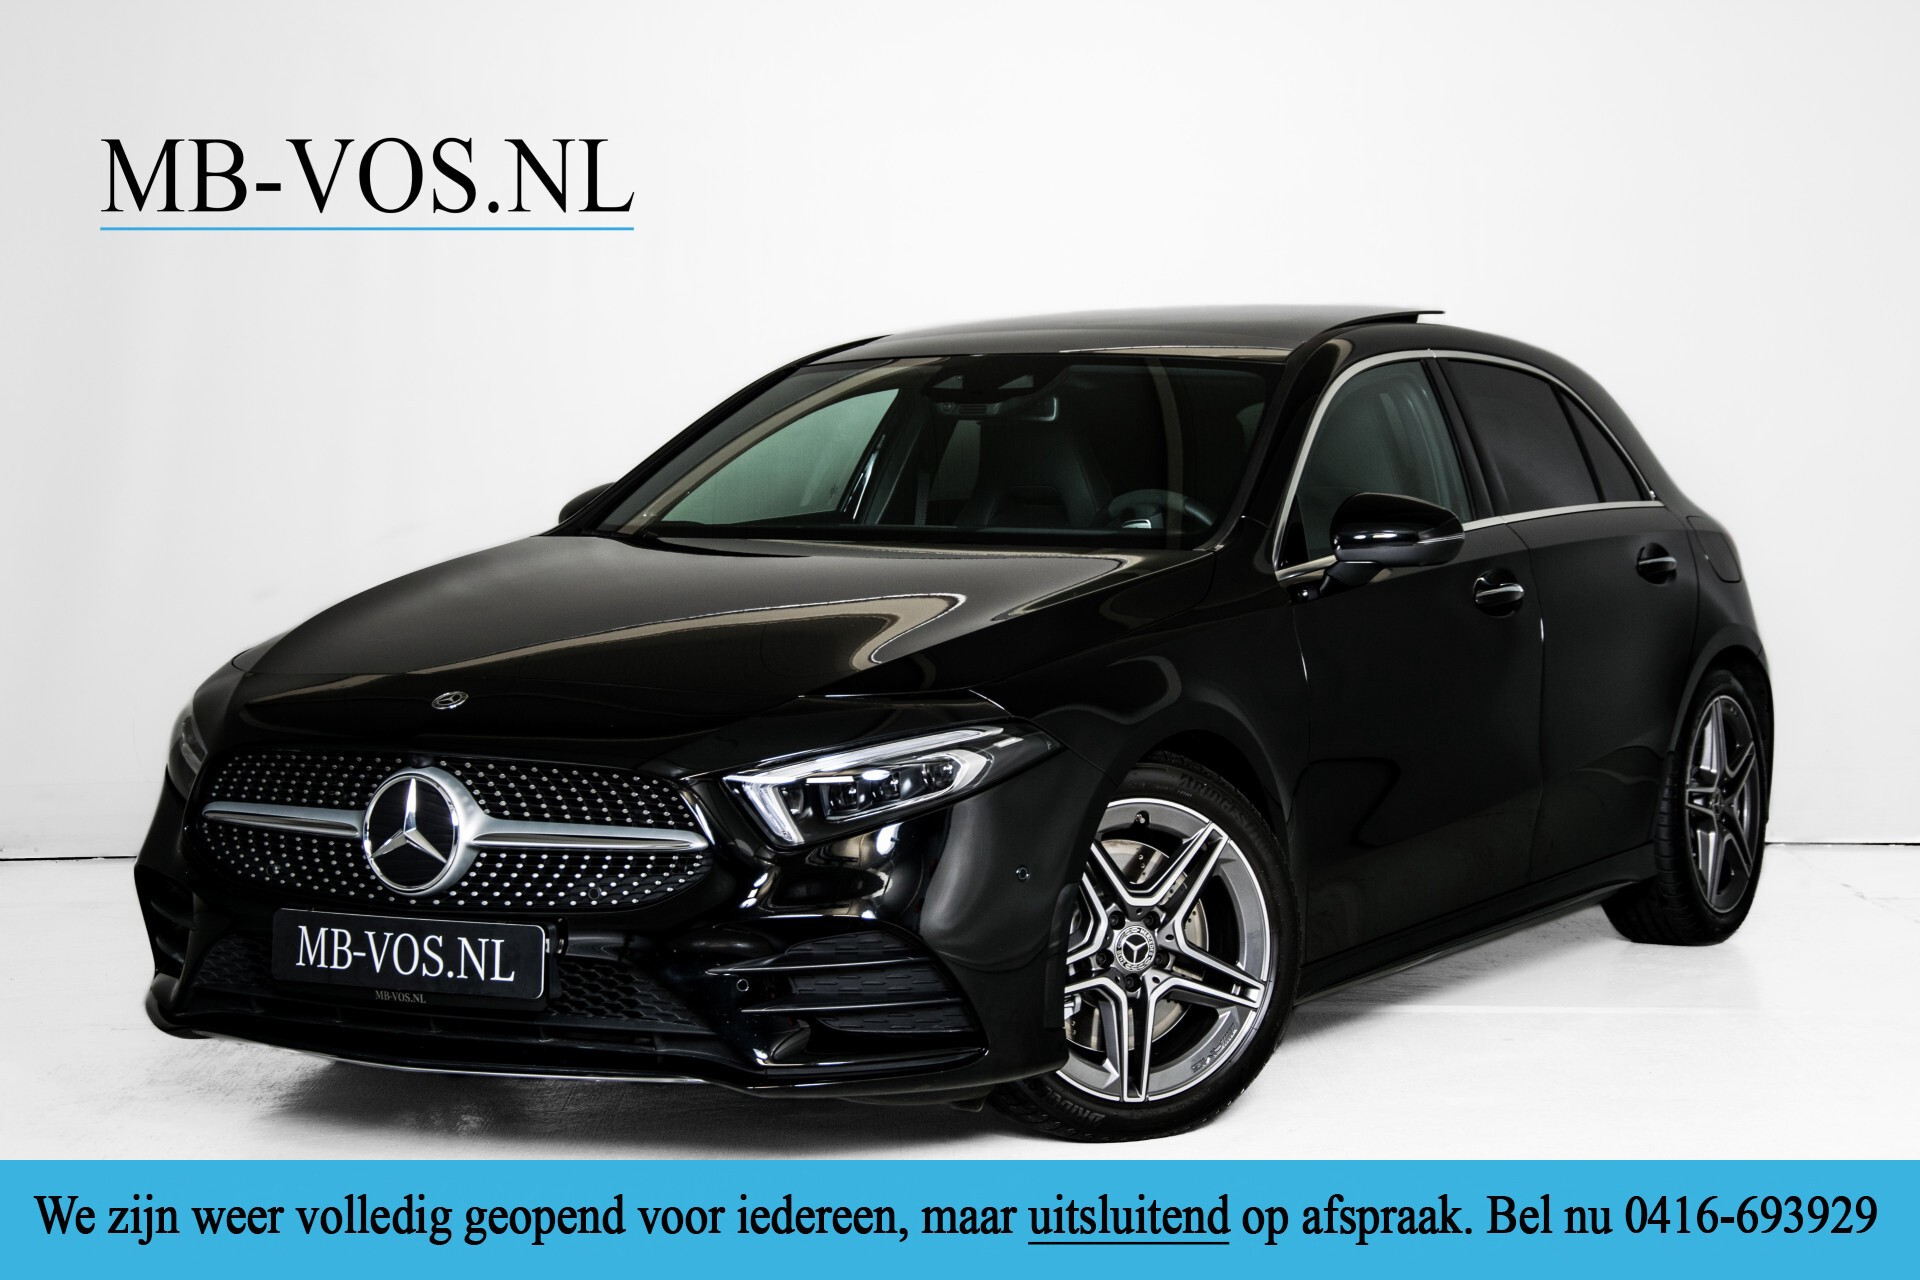 Mercedes-Benz A-Klasse 250 4-M AMG Panorama/Keyless-Entry/MBUX/HUD/Burmester/360/Multibeam LED Aut7 Foto 1